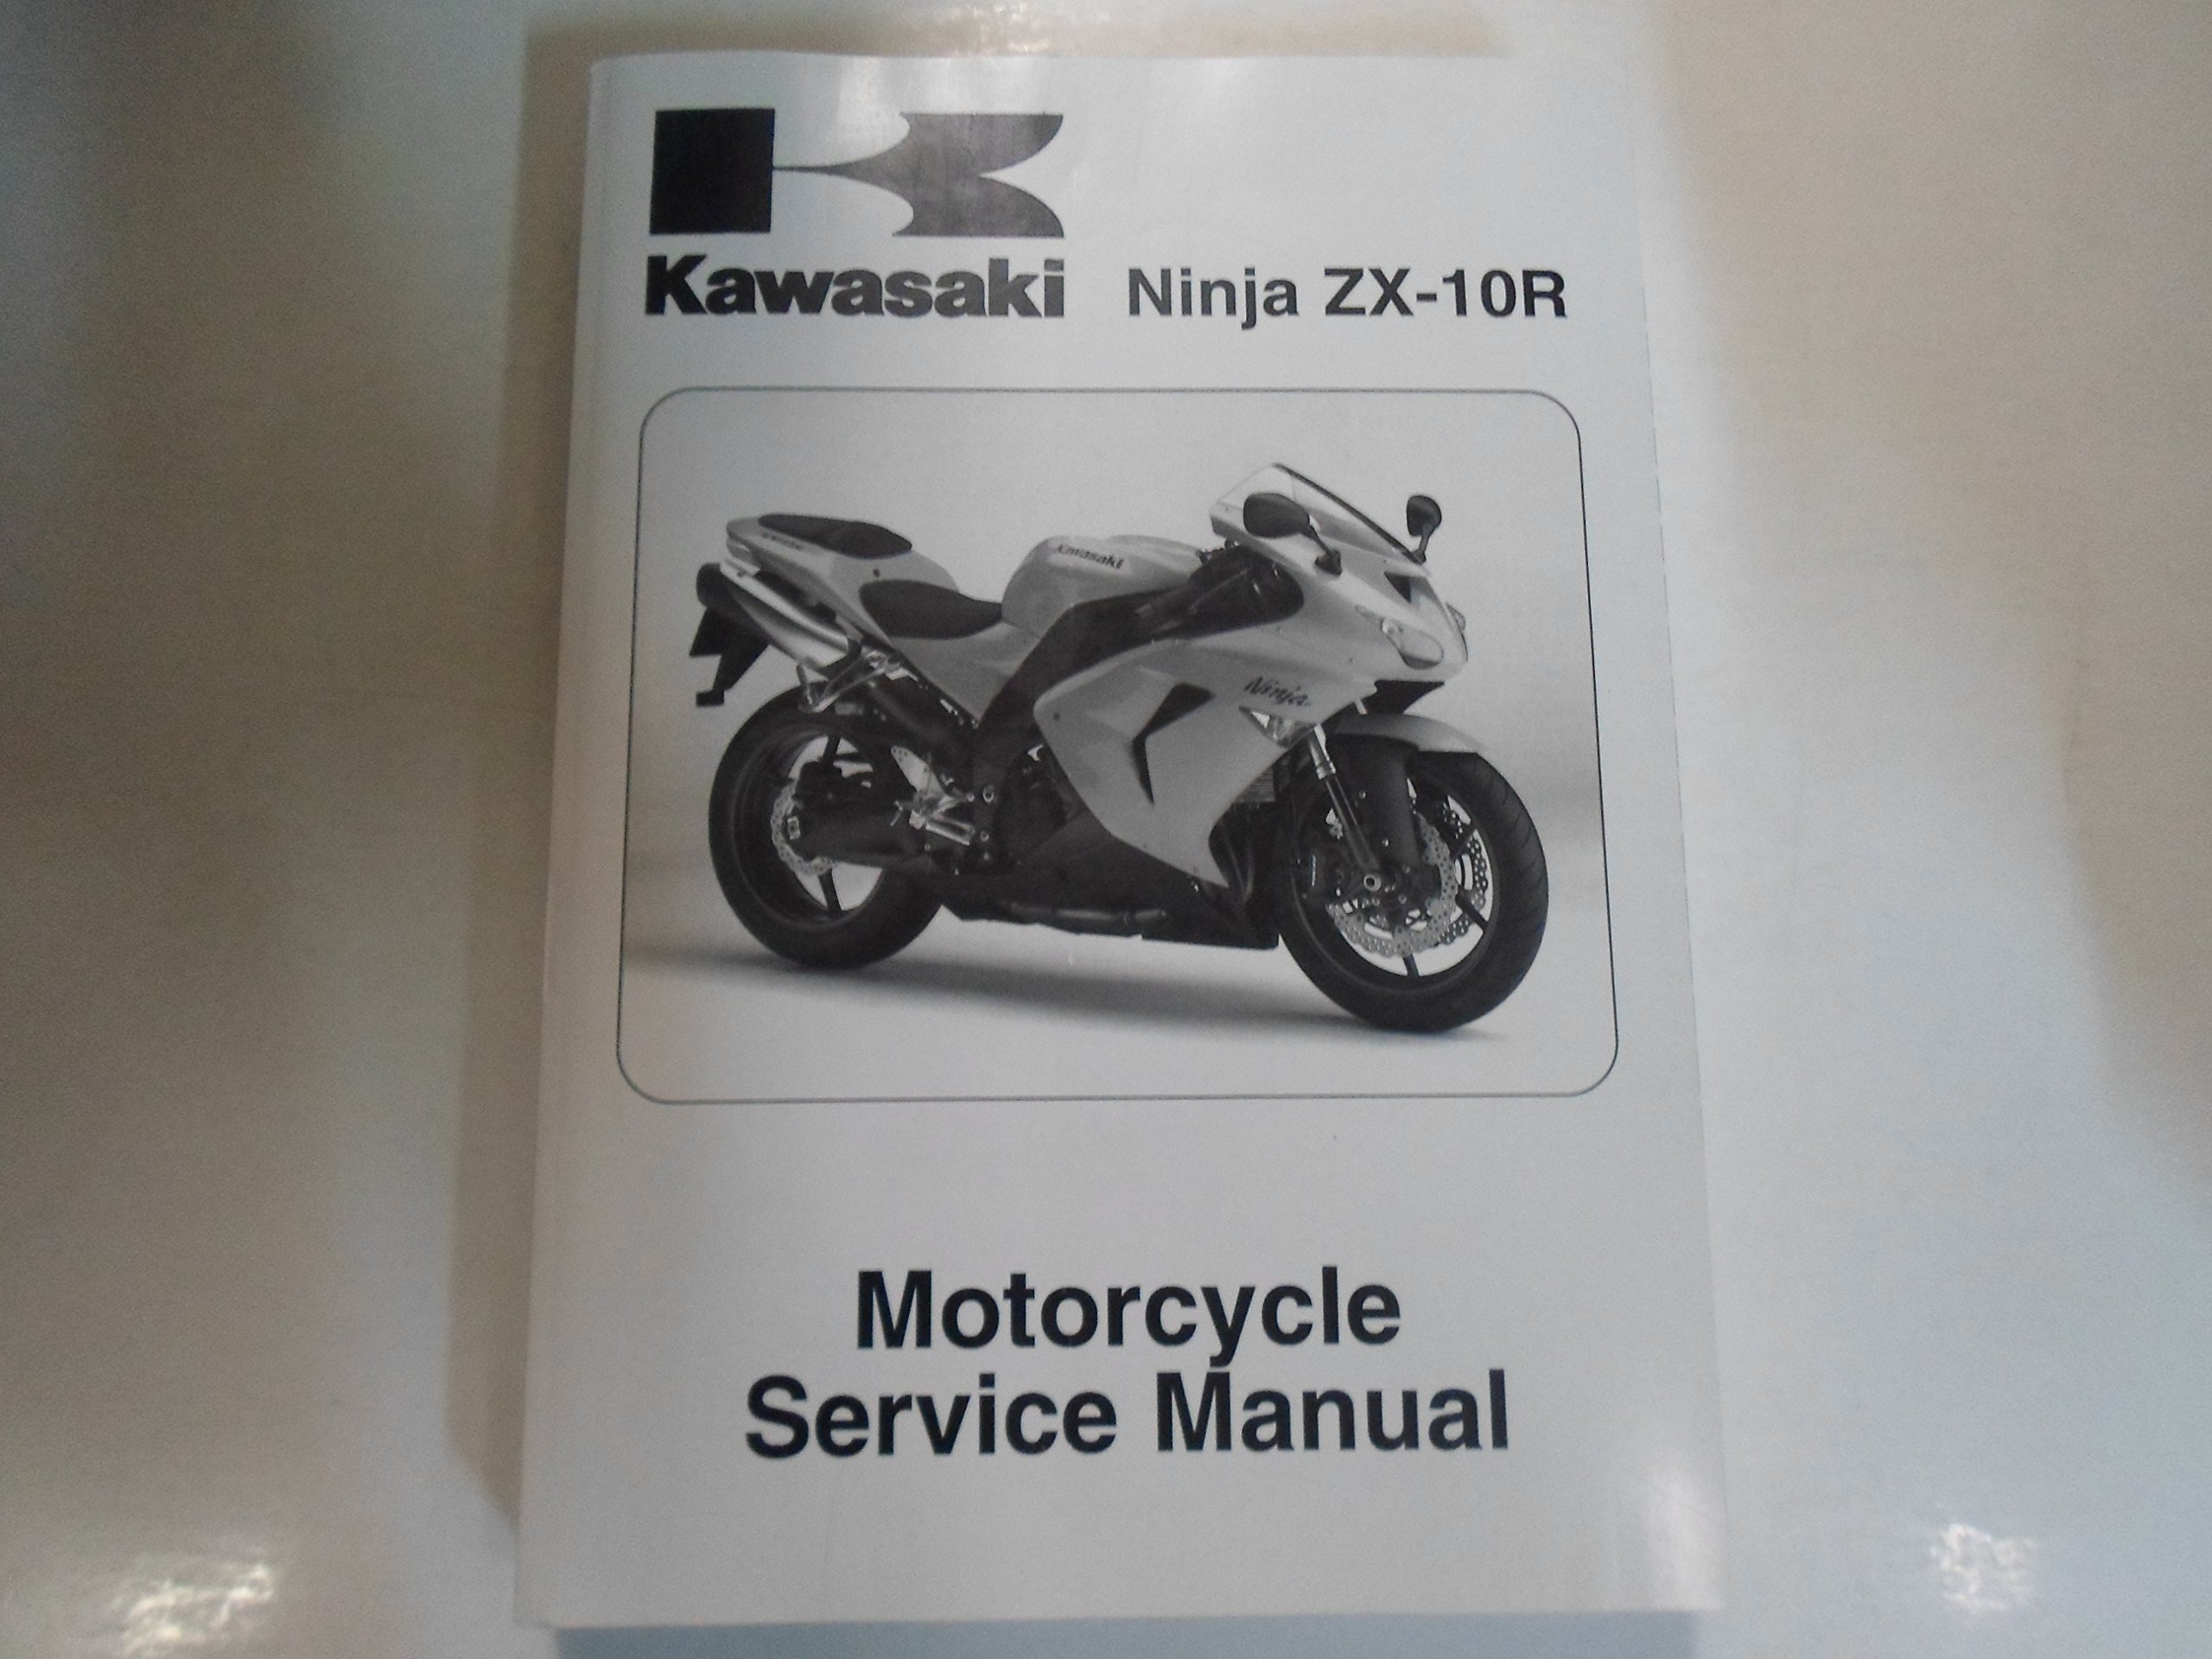 2006 2007 Kawasaki Ninja ZX-10R Motorcycle Service Repair ...